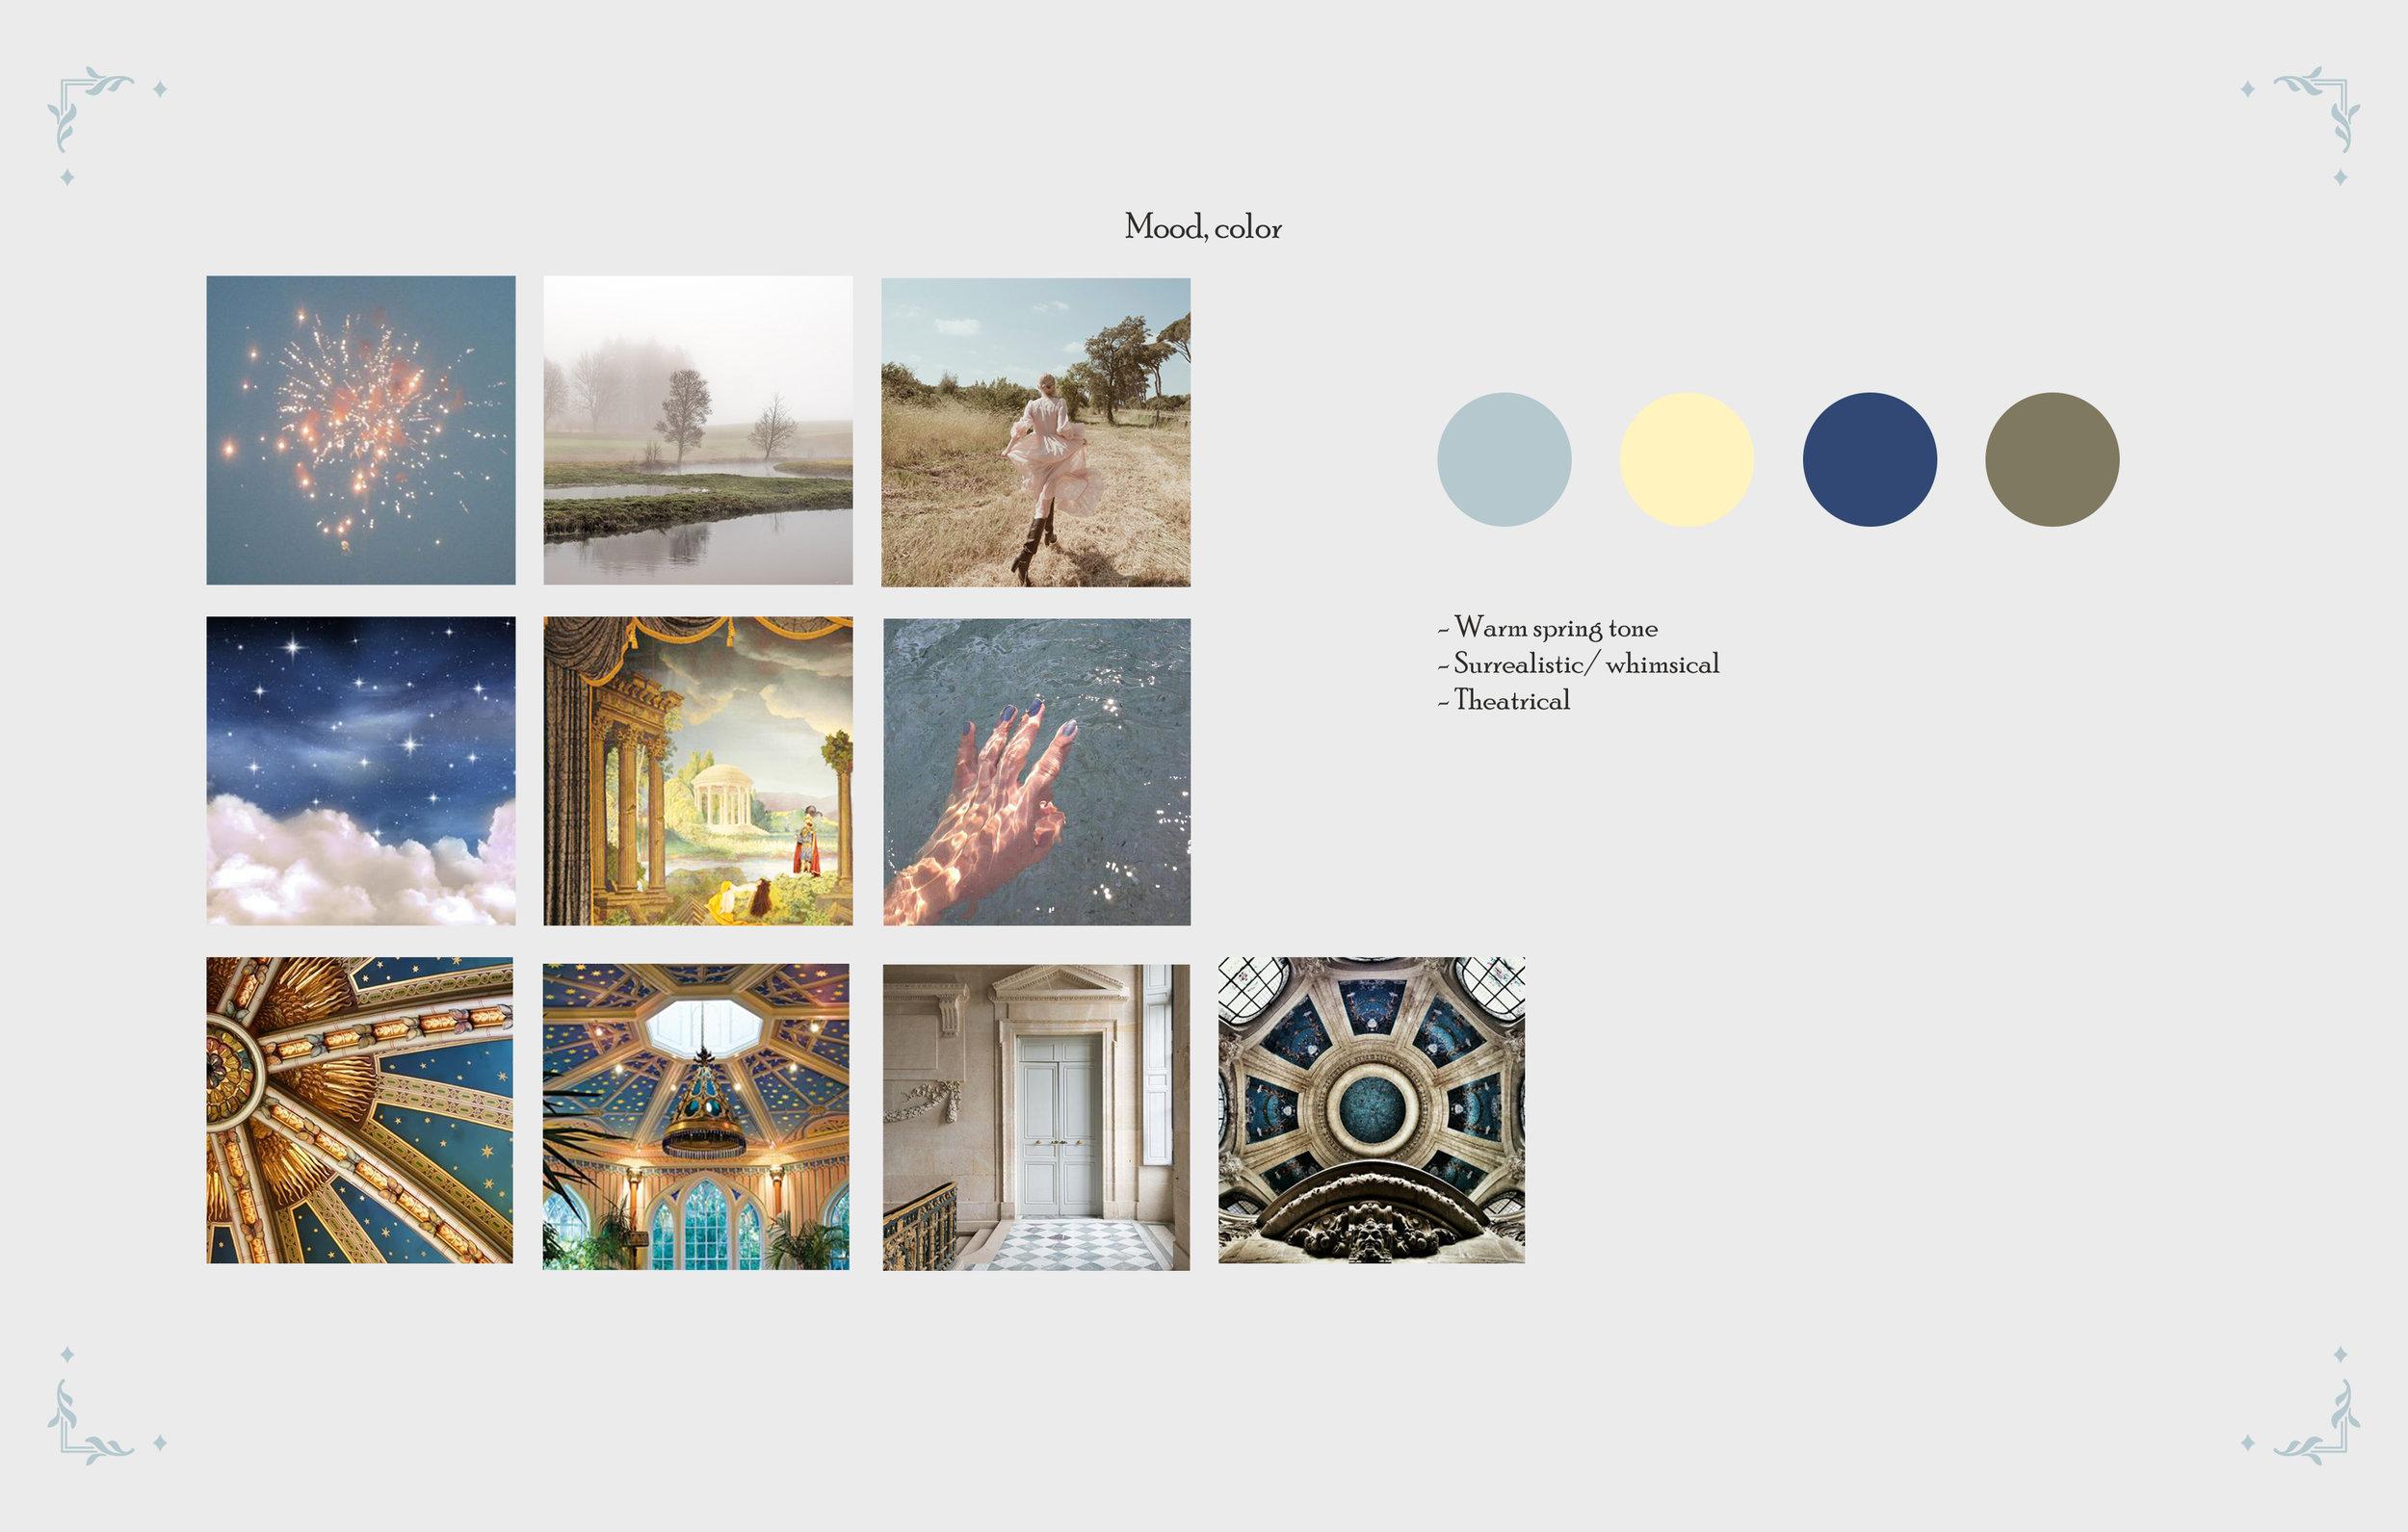 7. mood, color.jpg